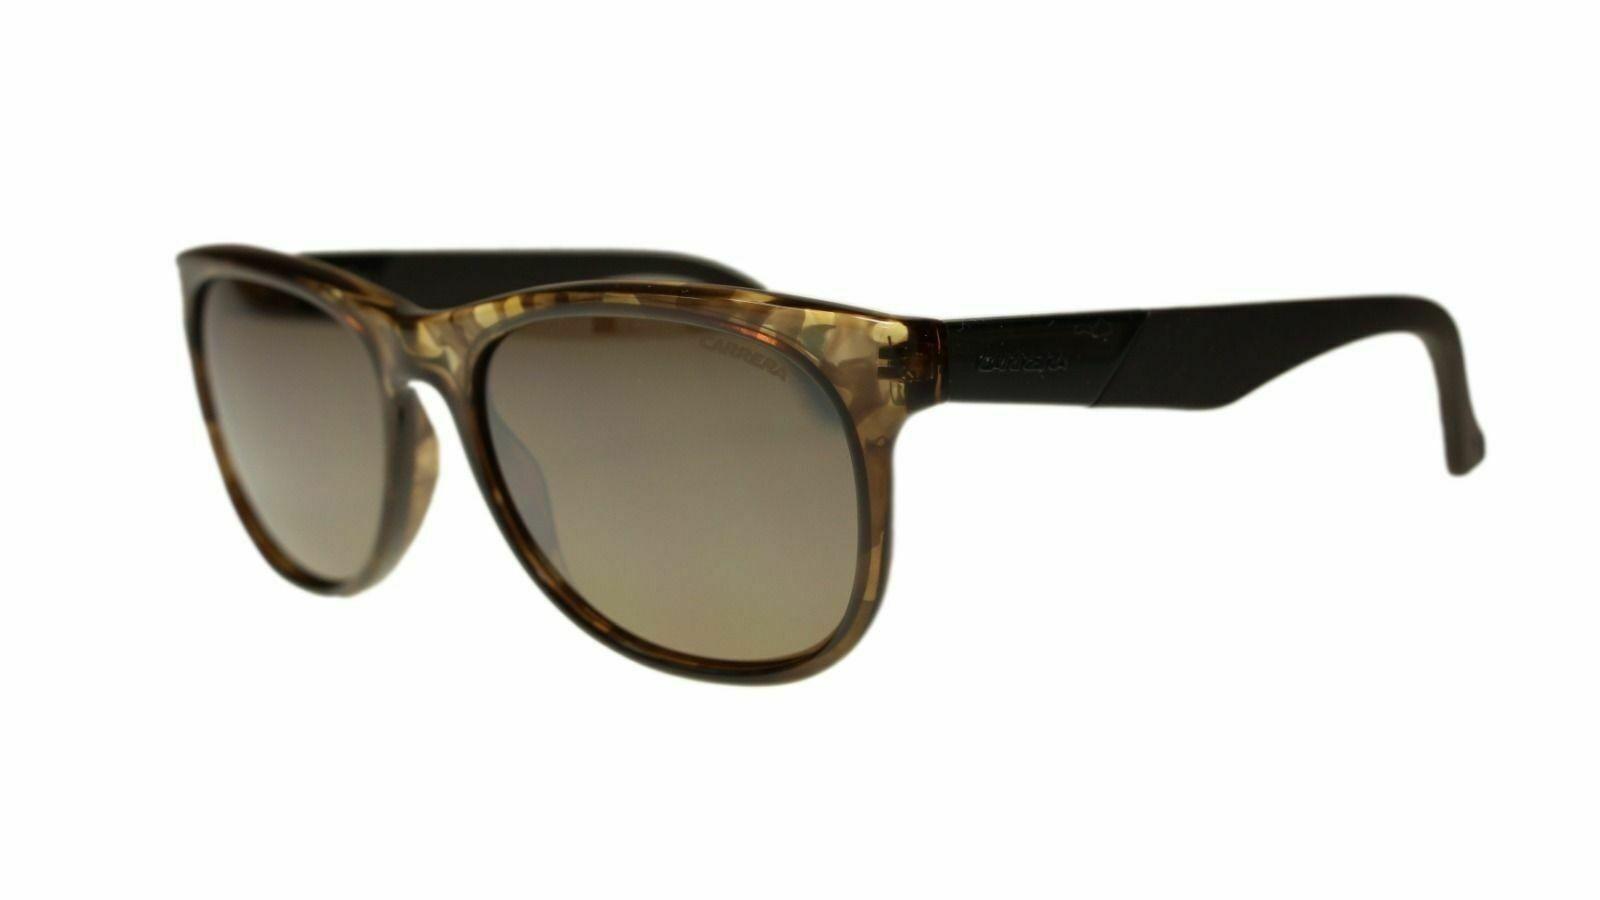 Carrera 5010 8GR 8HC 8HD 8HA Camo Rectangle Unisex Sunglasses 55mm Authentic - $40.00